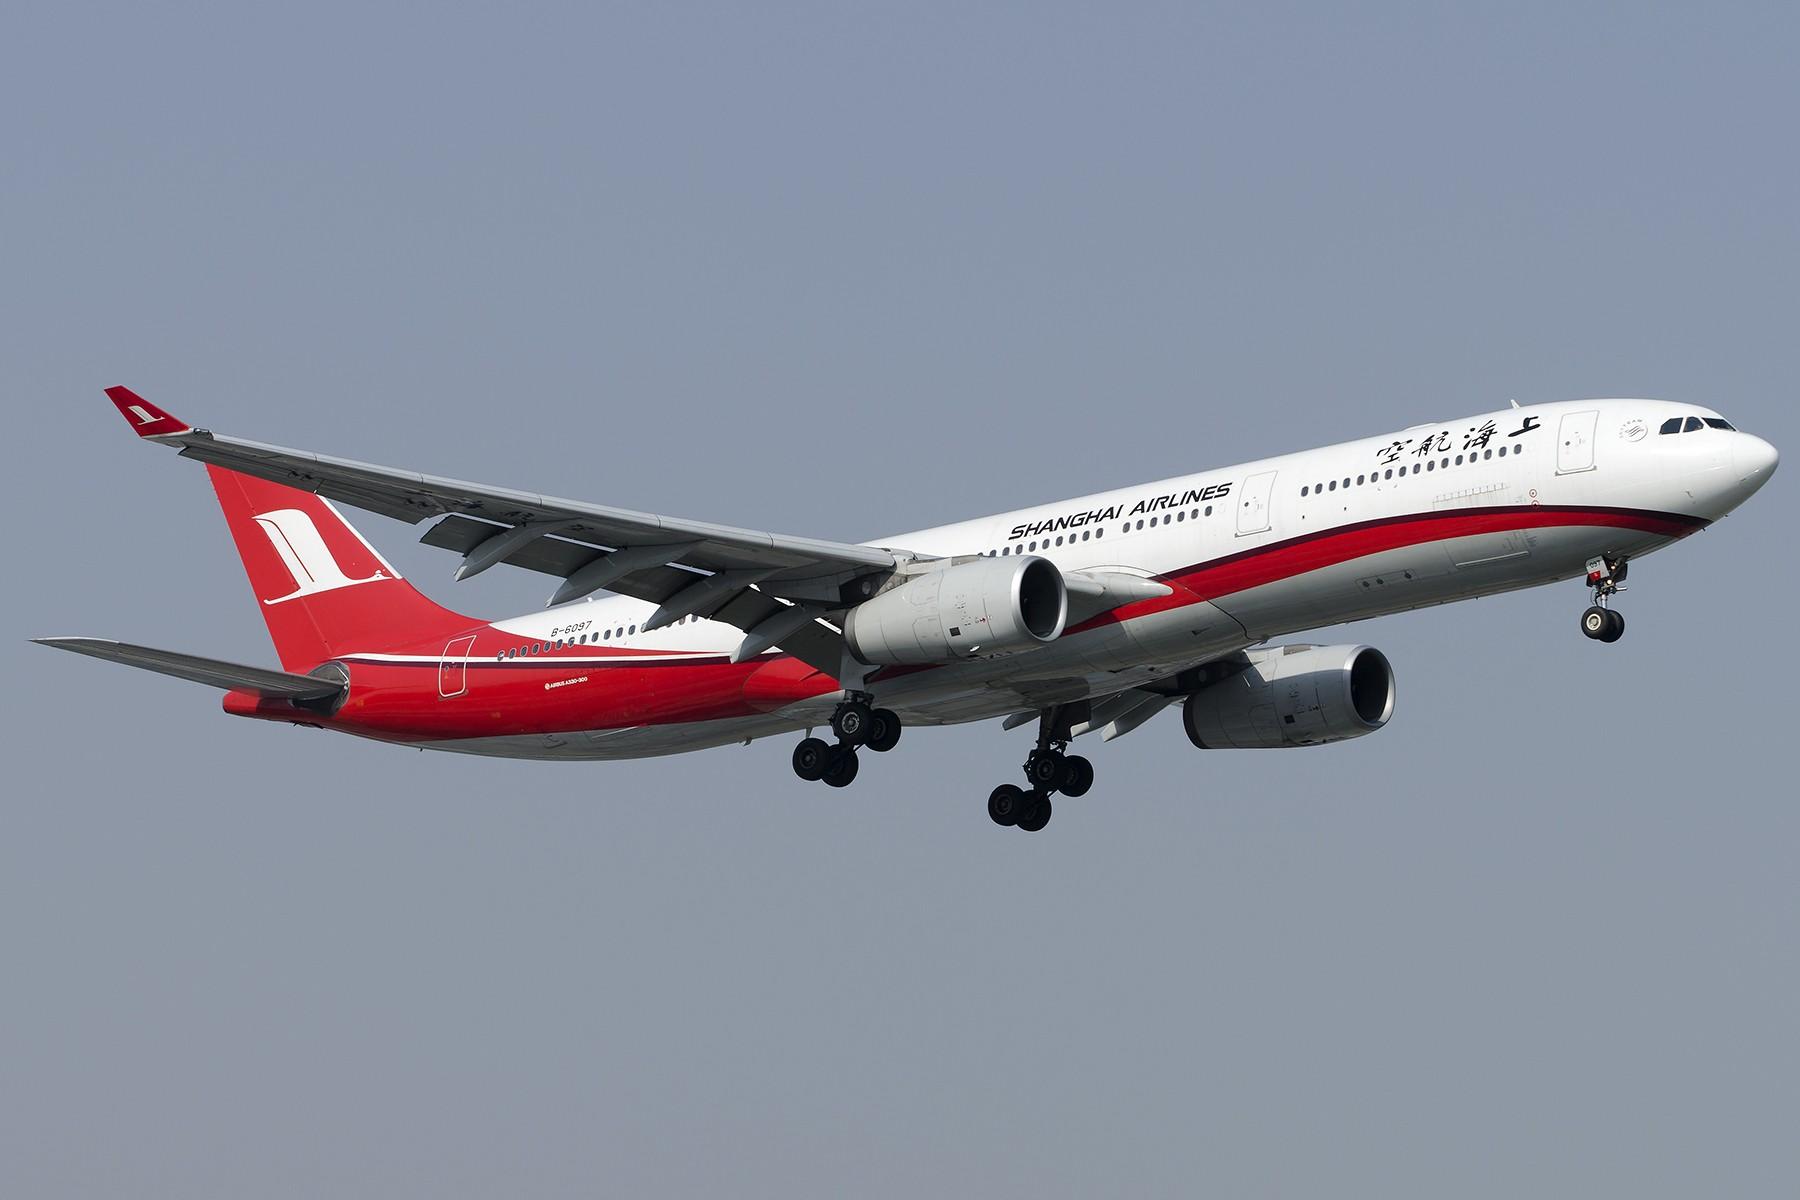 Re:[原创][原创]【SHA拍机*1800大图】4月拍的了,记得那天好货还挺多 AIRBUS A330-300 B-6097 中国上海虹桥国际机场